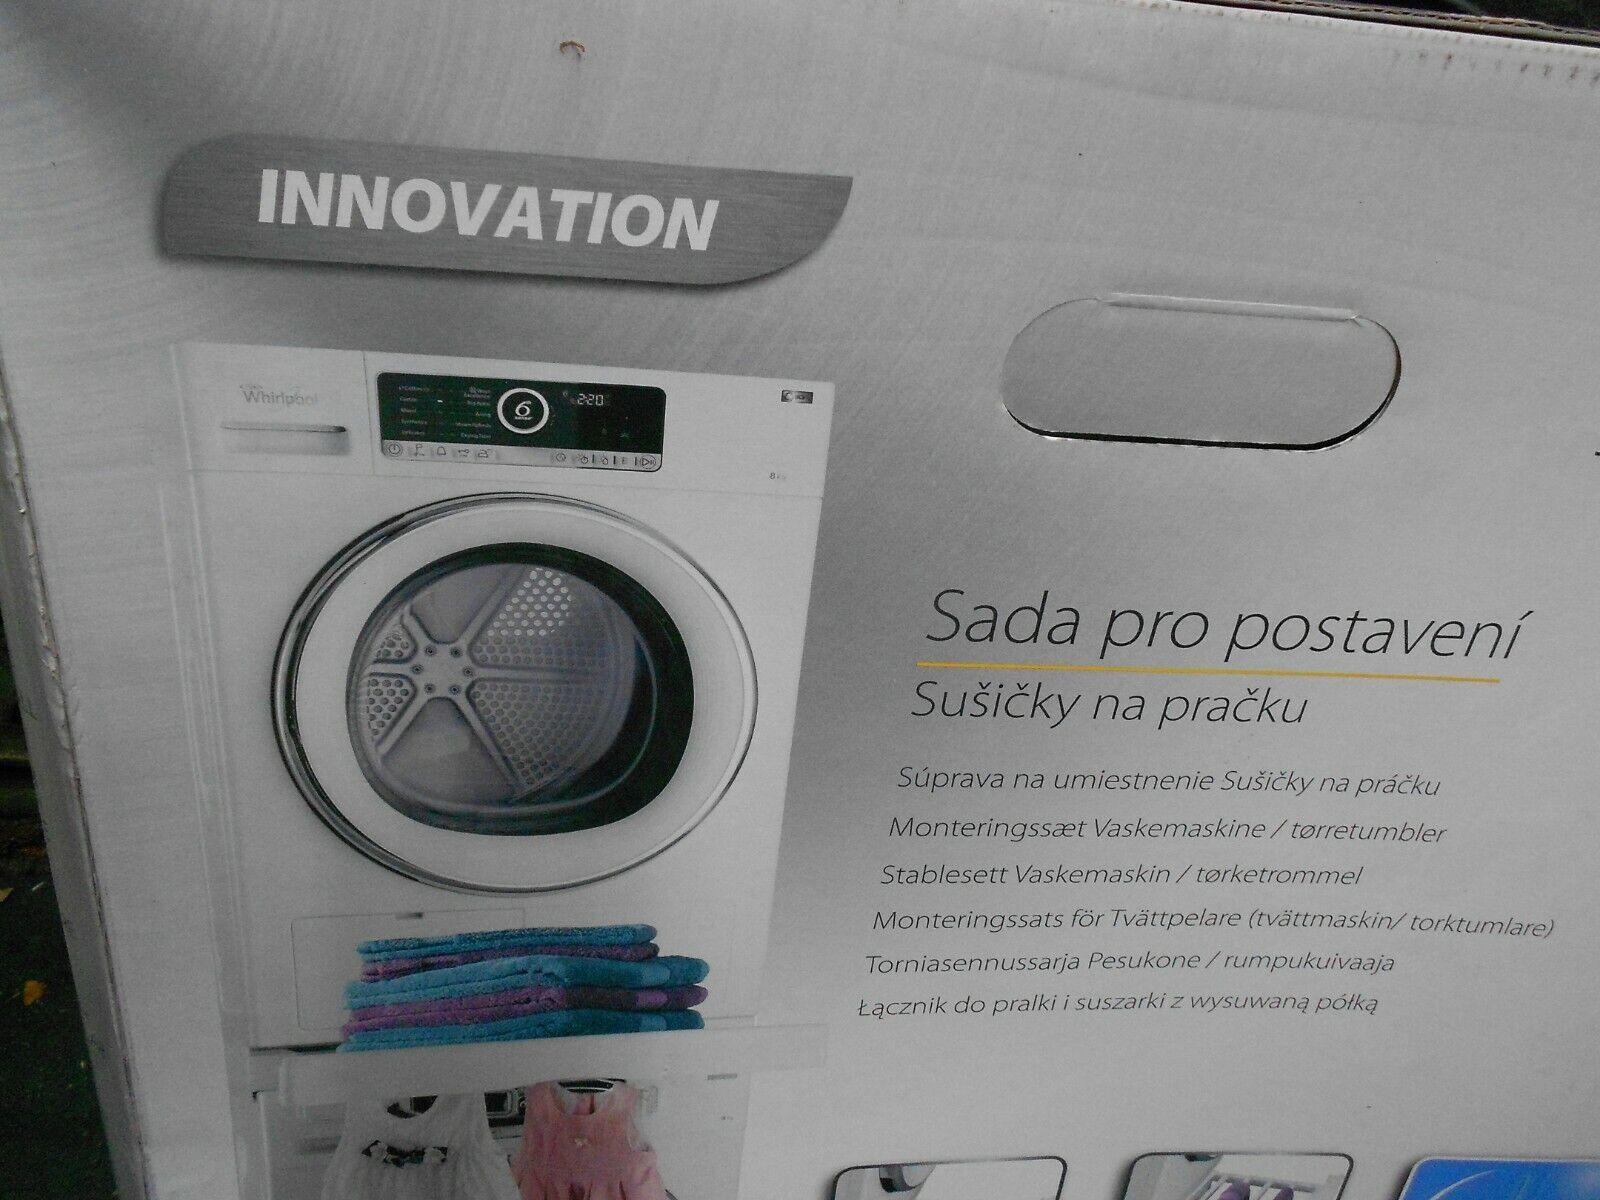 sks200 stacking kit for washer dryer